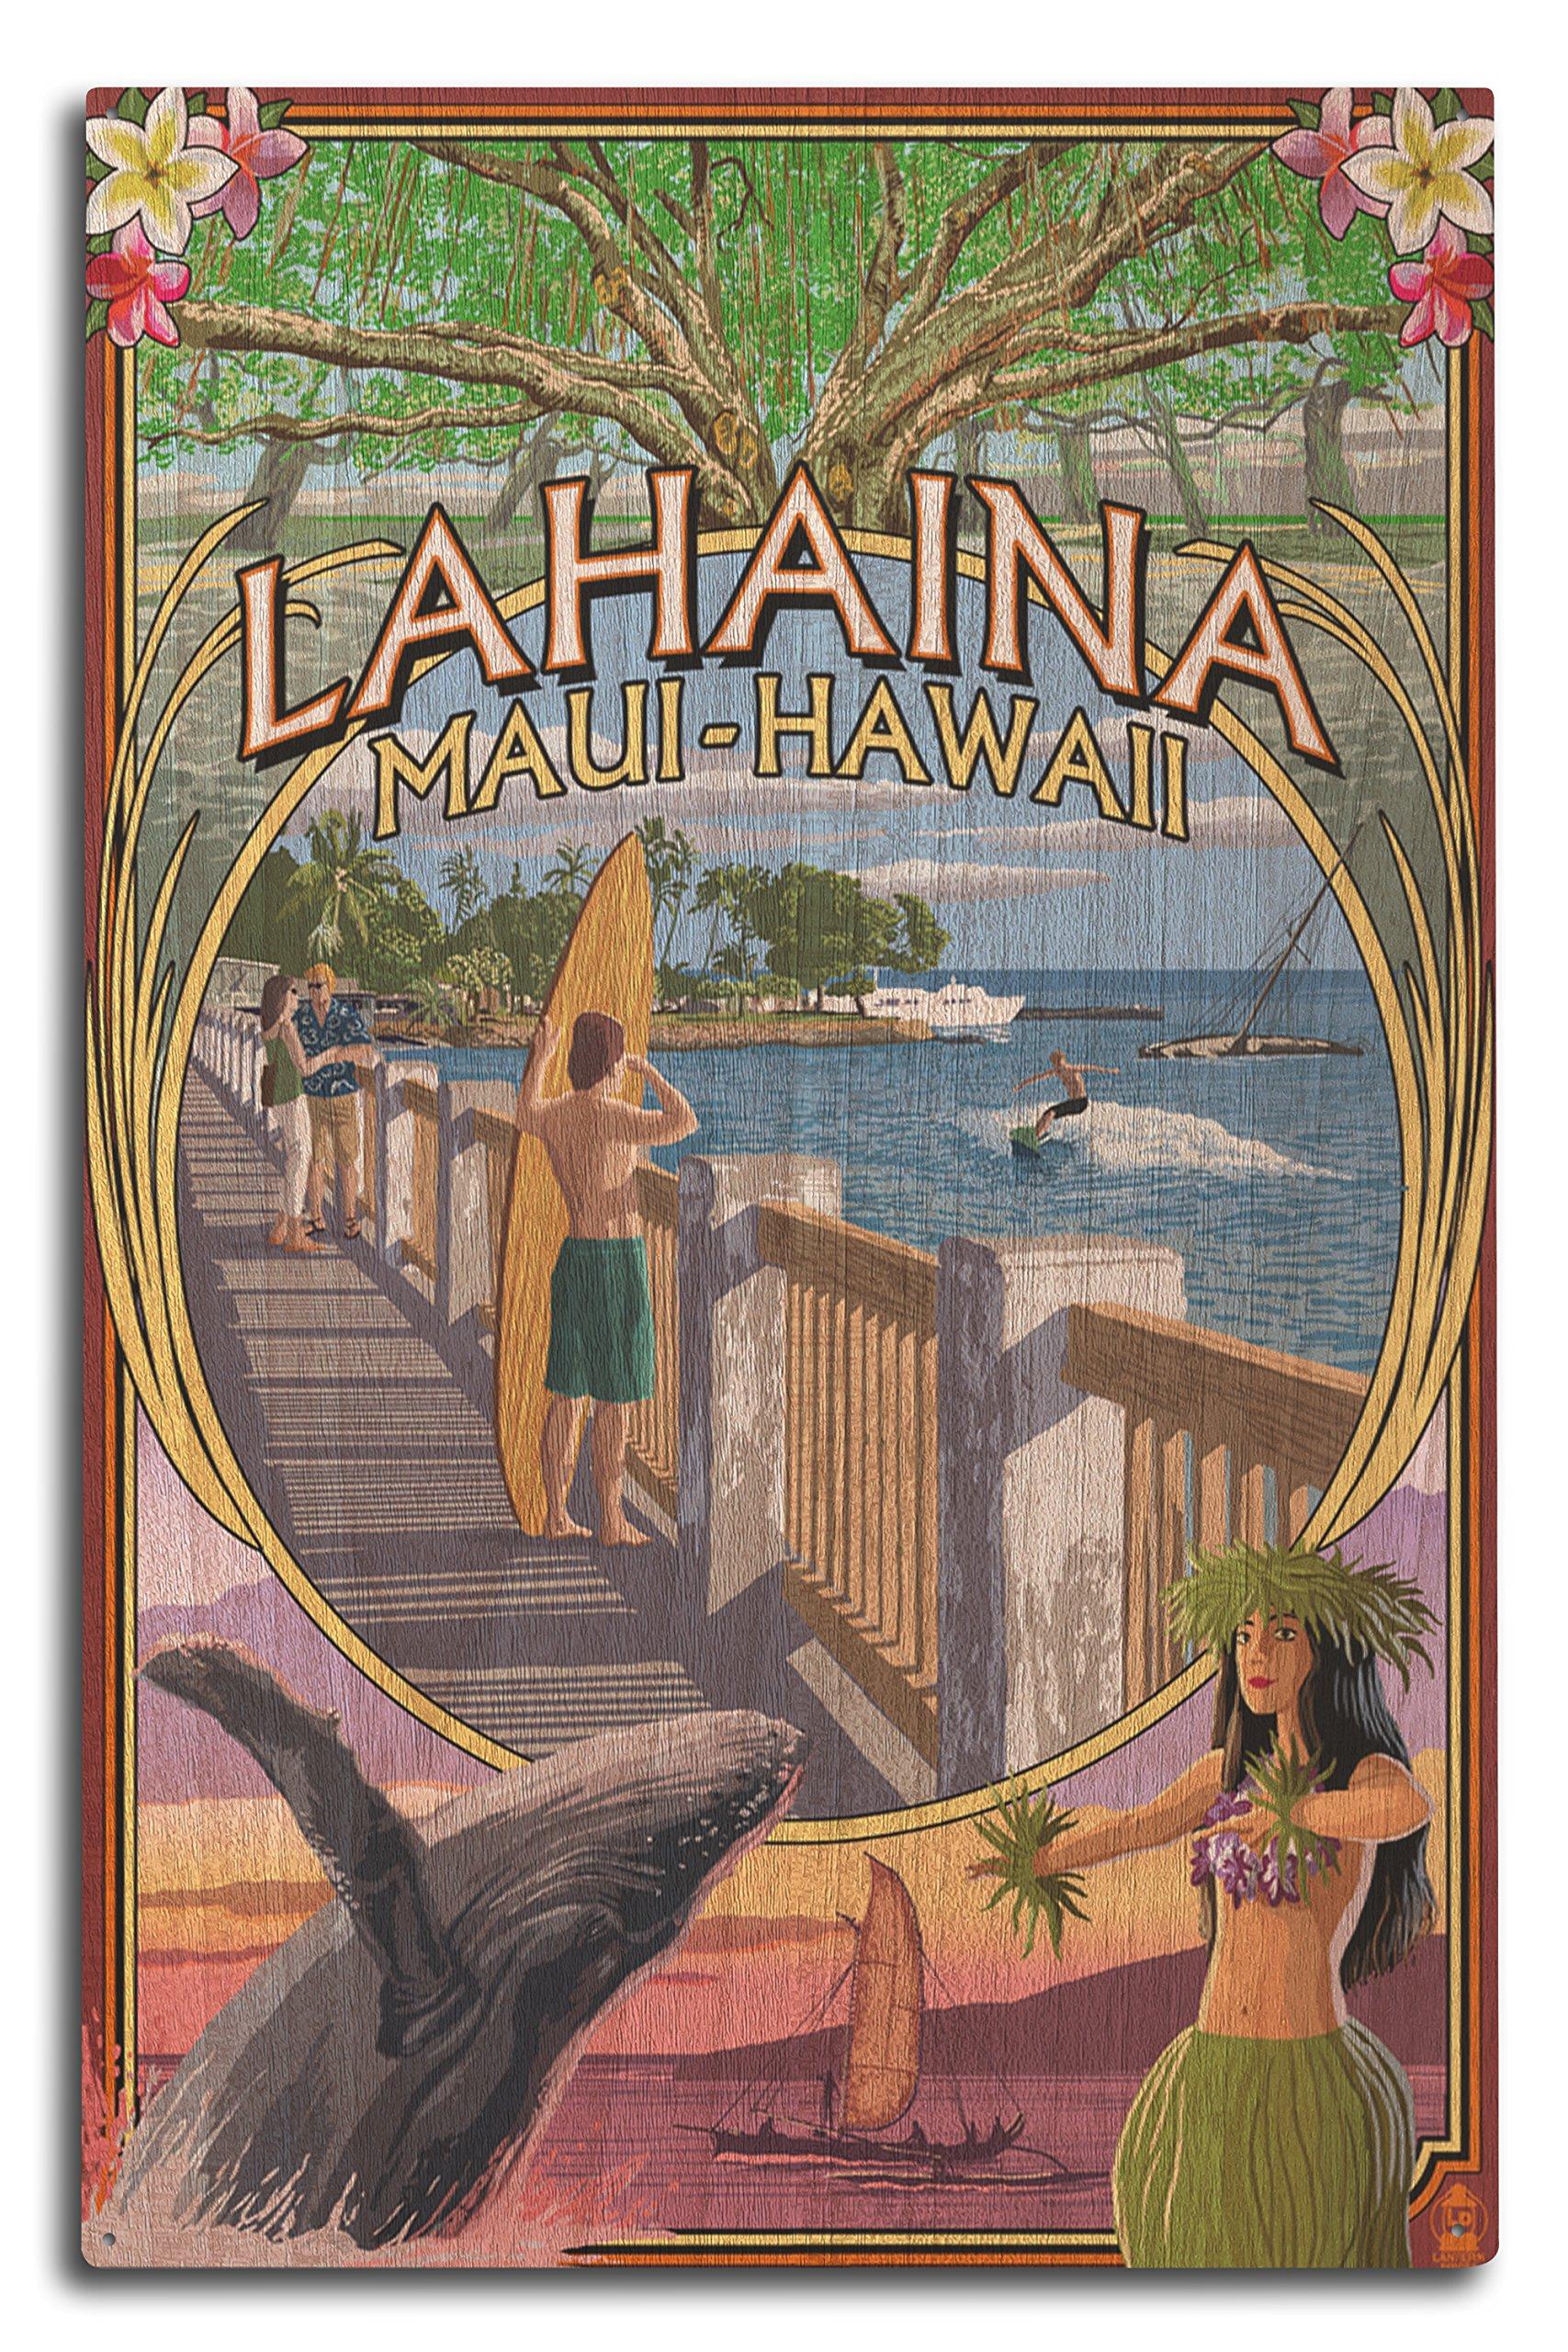 Lahaina, Maui, Hawaii - Town Scenes Montage (10x15 Wood Wall Sign, Wall Decor Ready to Hang)